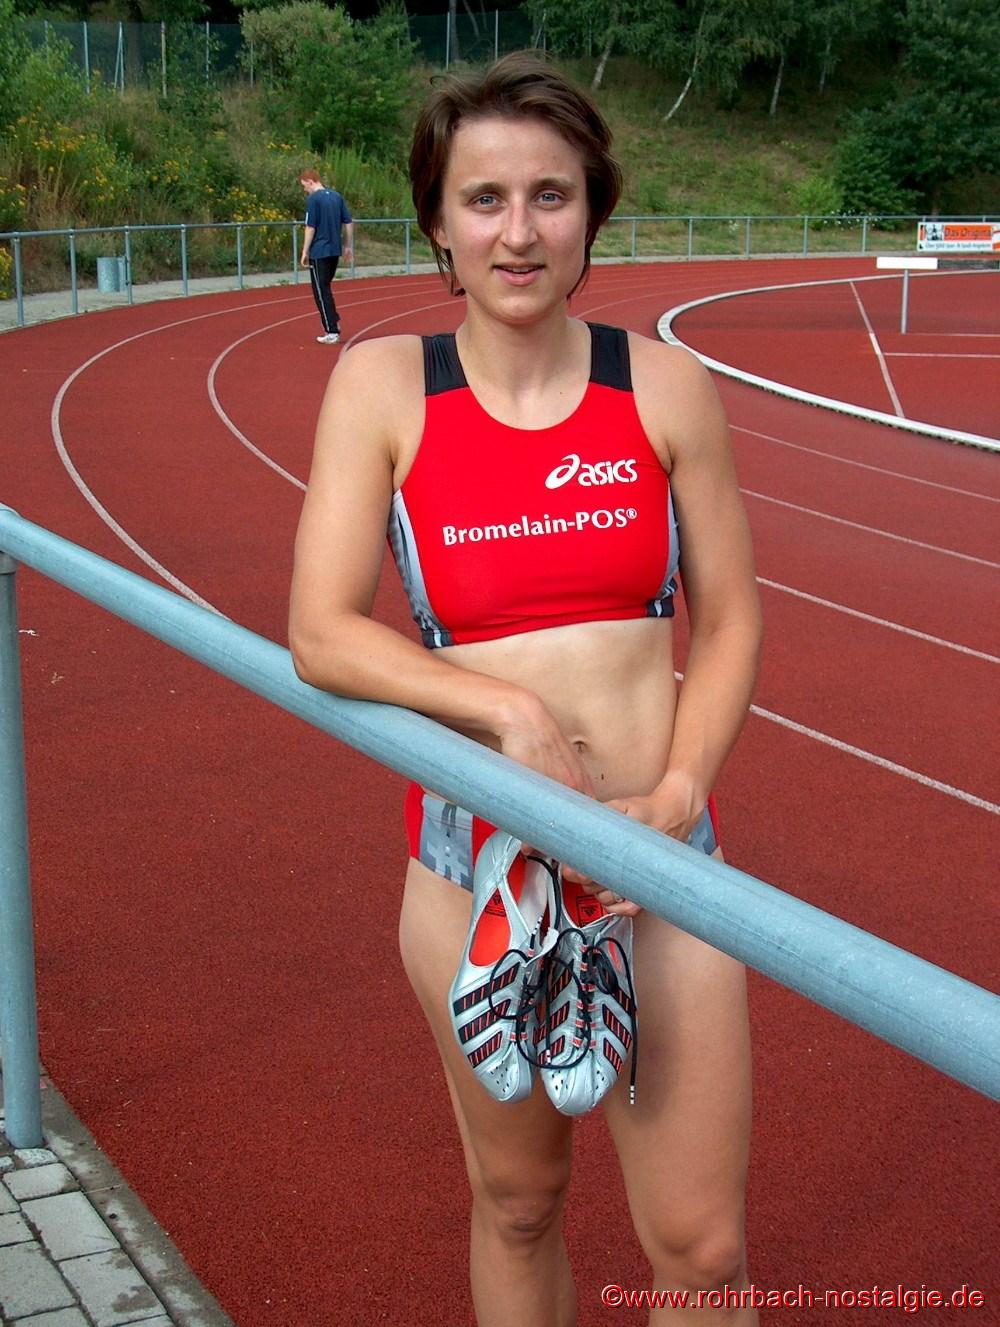 Im Juili 2003 Sandra Abel im Trikot ihres neuen Vereins SV Saar o5 Saarbrücken